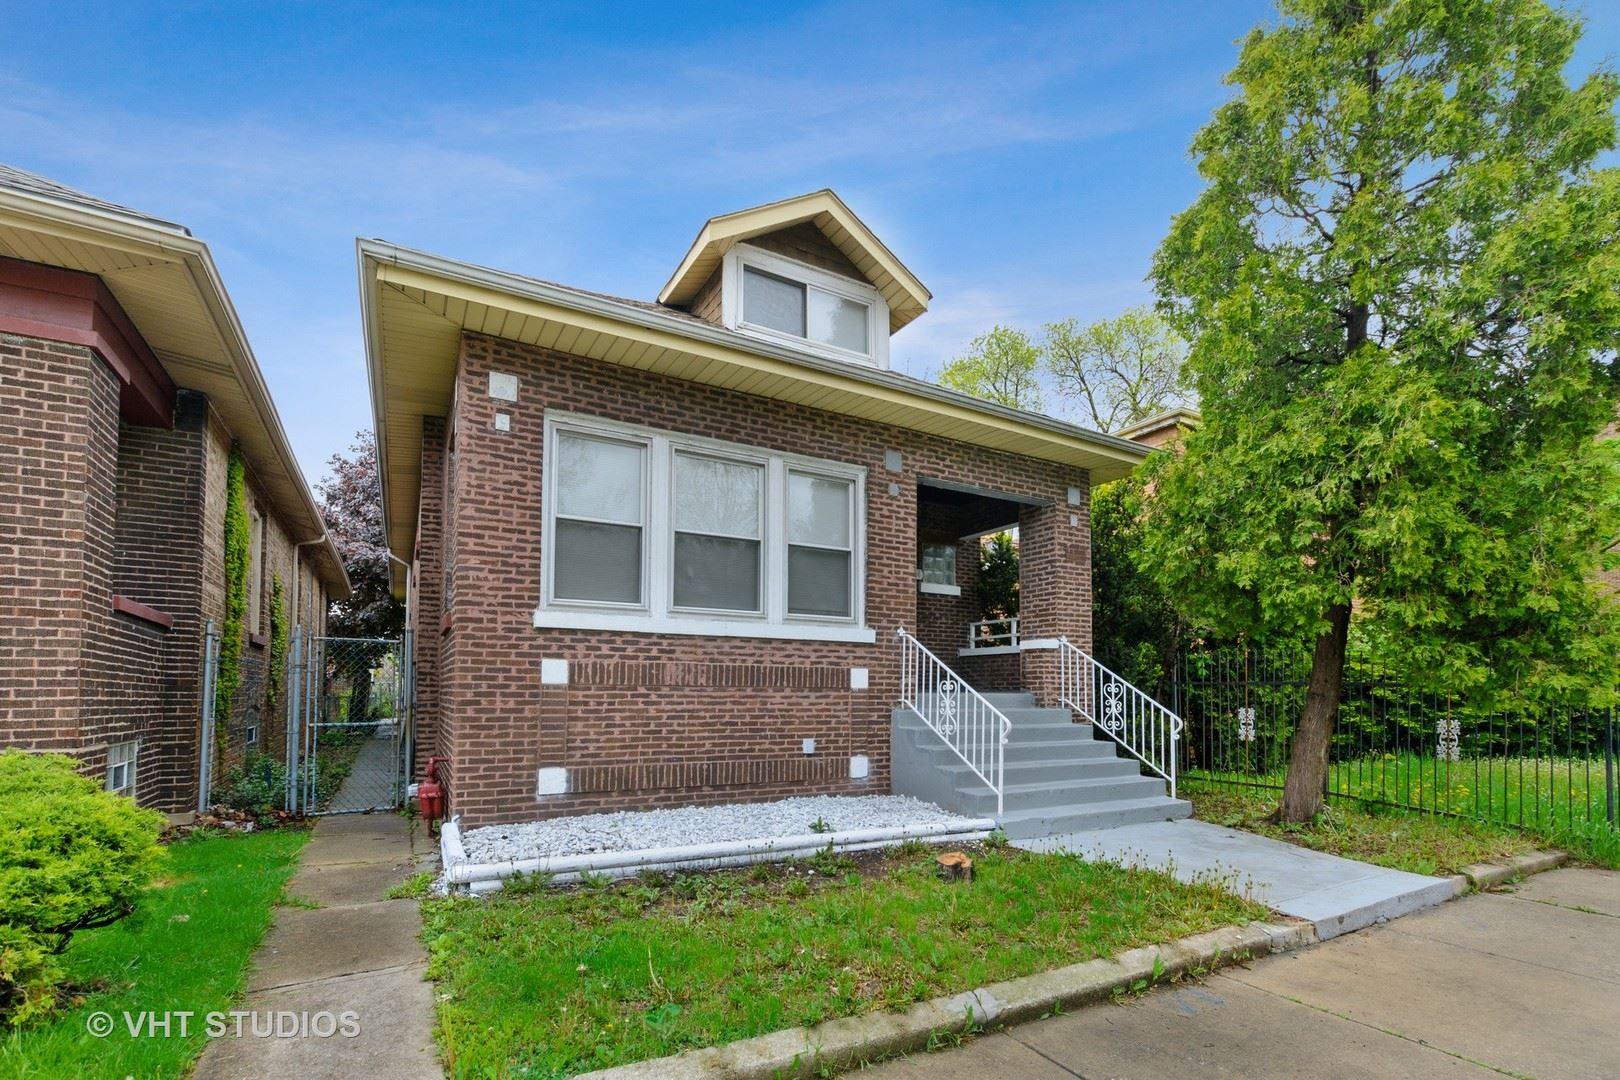 8104 S Laflin Street, Chicago, IL 60620 - #: 10716980